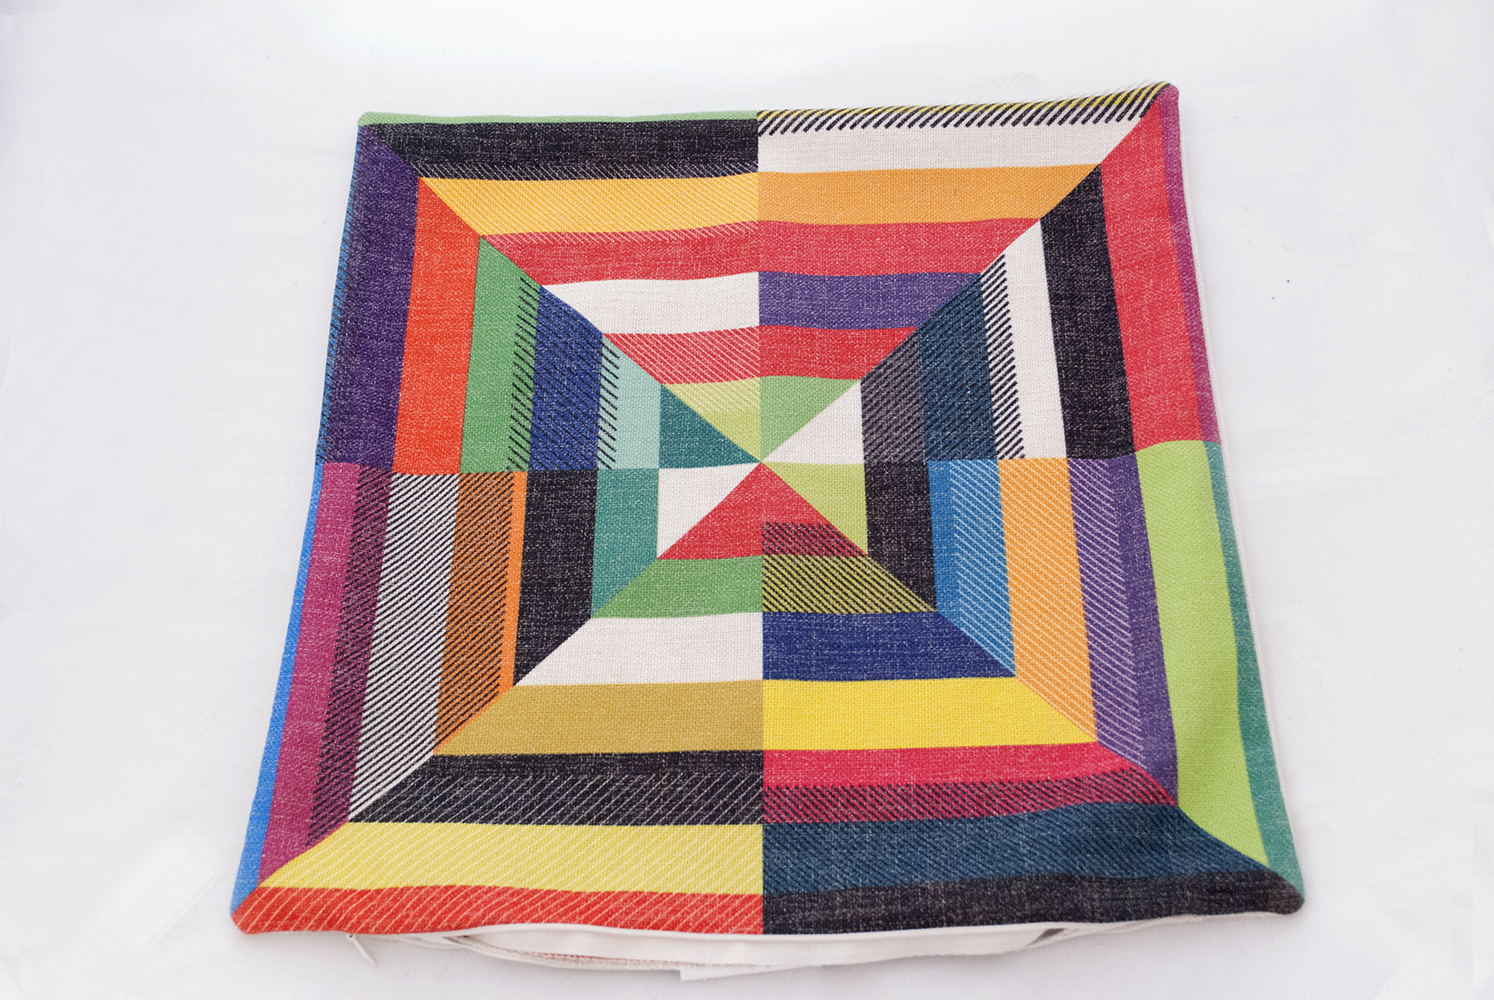 color block pillow   Quantity: 2  Price: $10.00